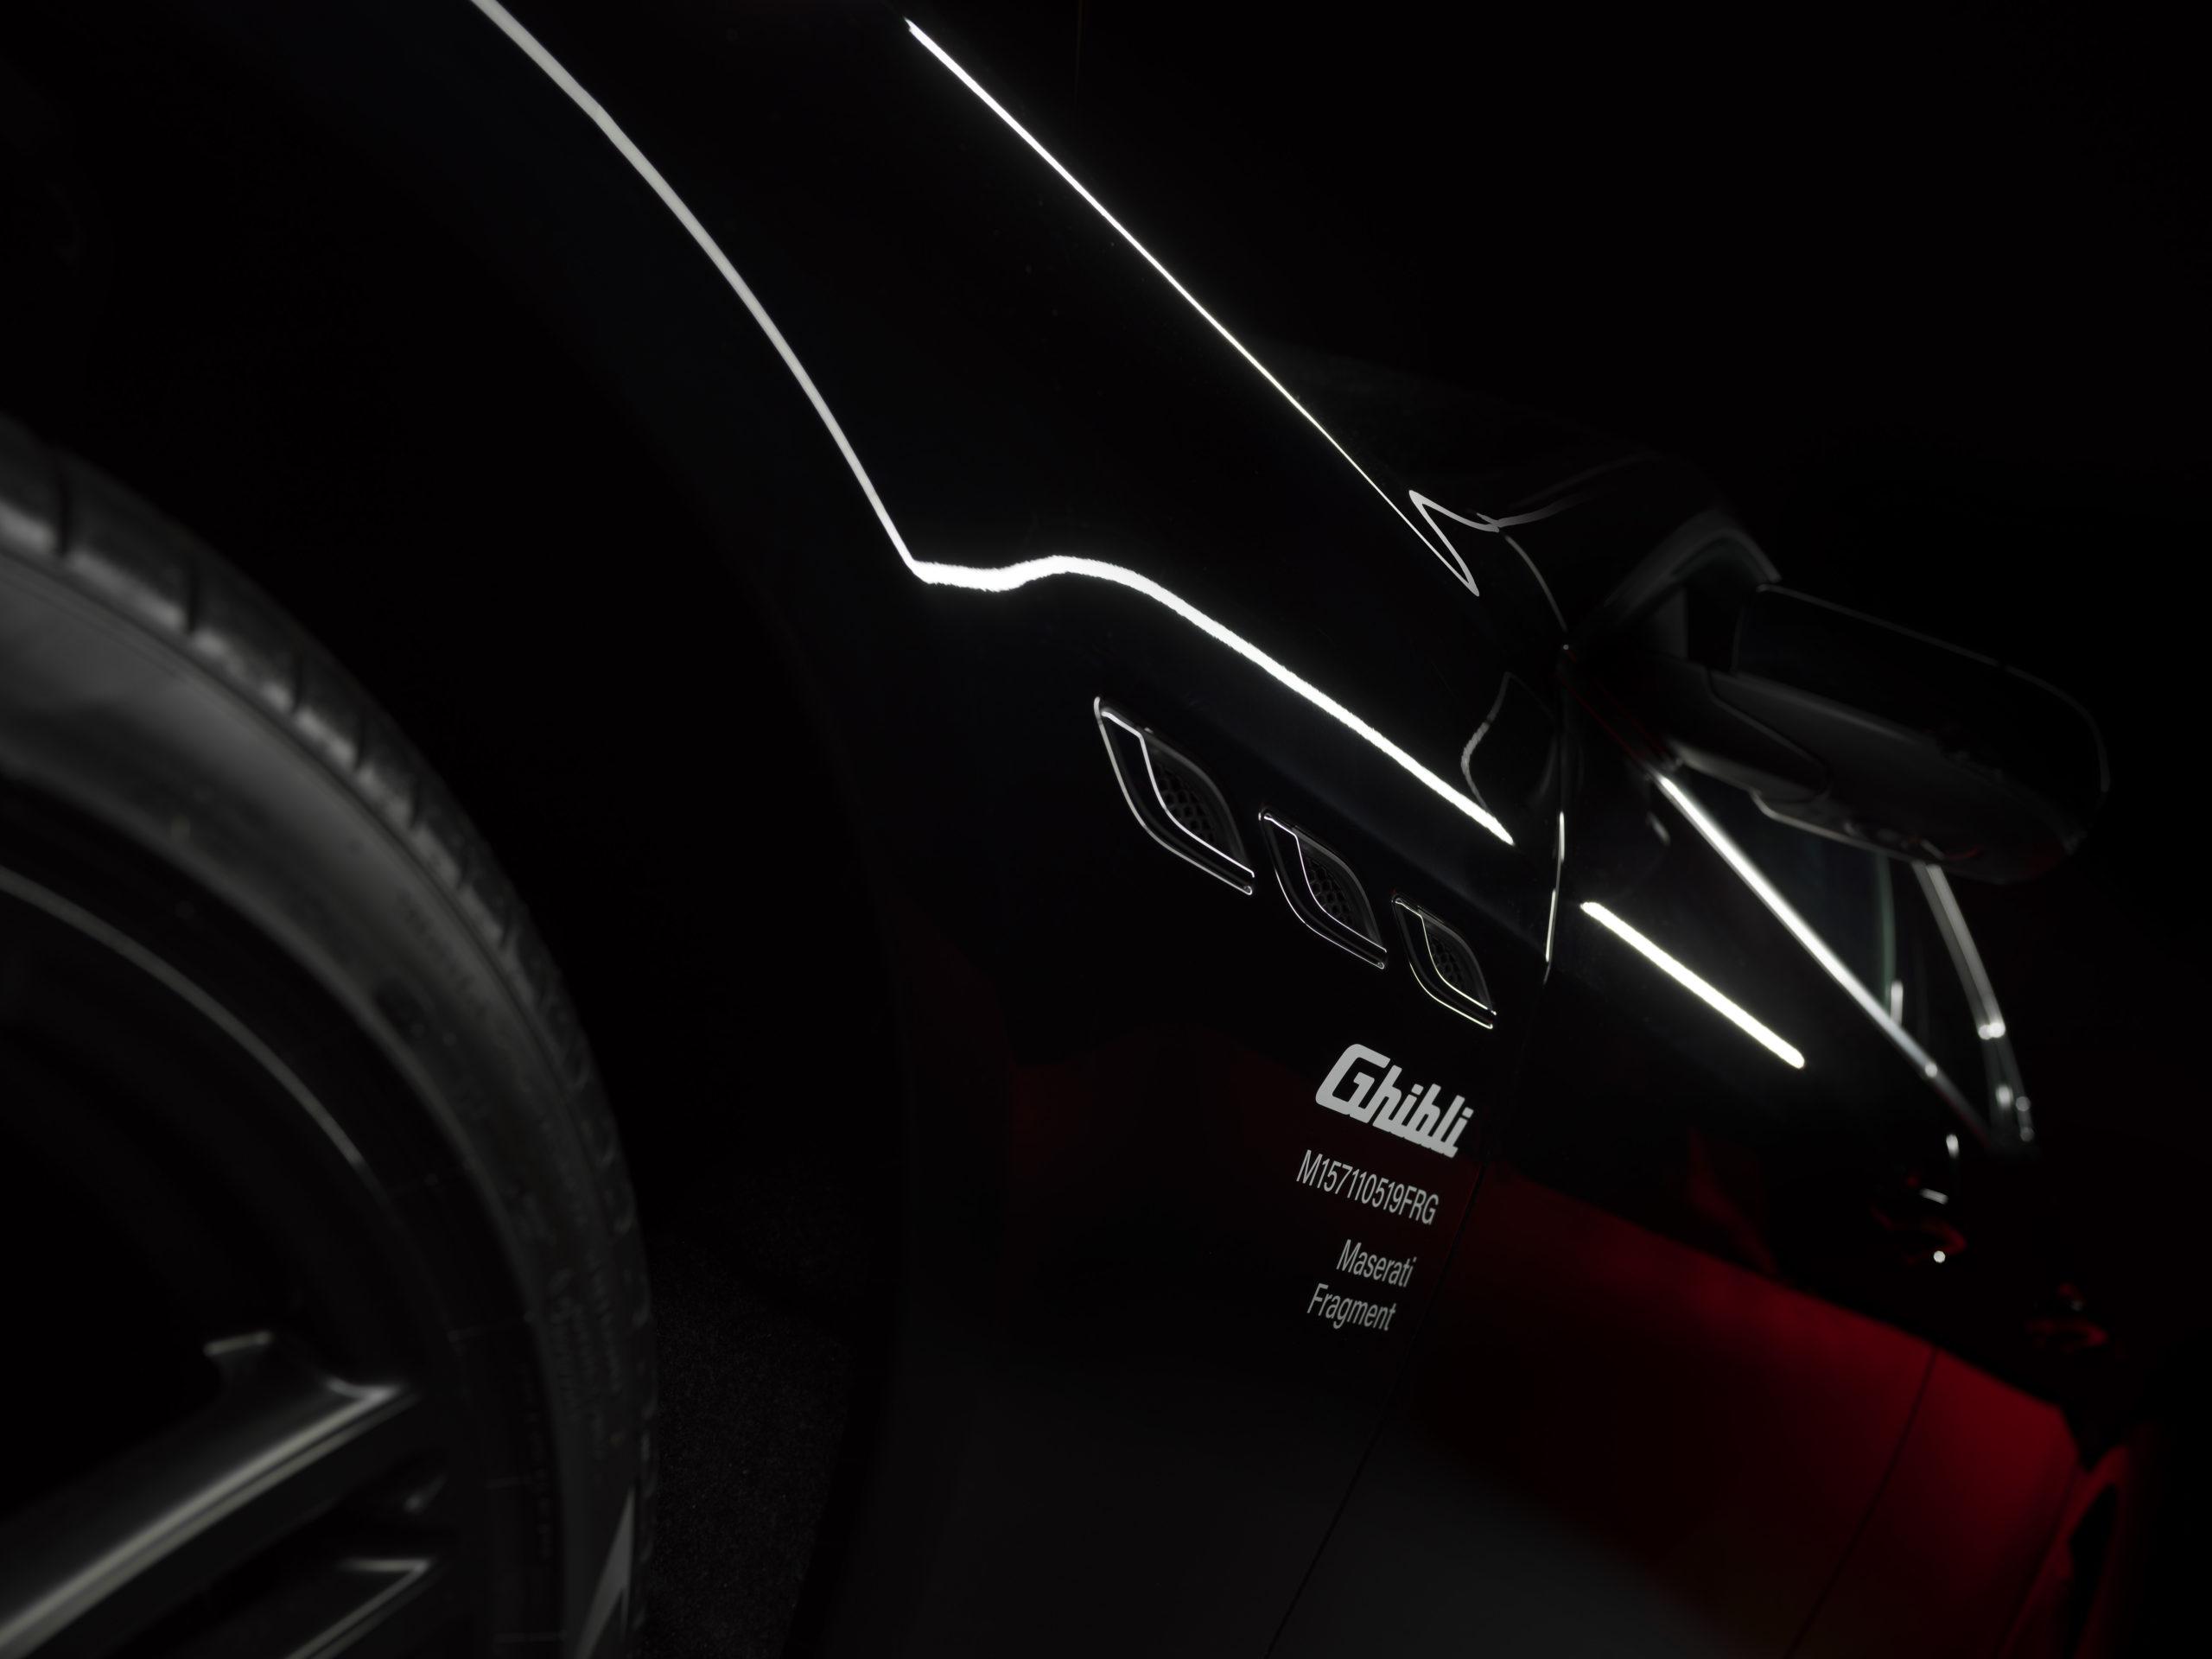 Maserati Ghibli Special Edition - Fragment - Hiroshi Fujiwara